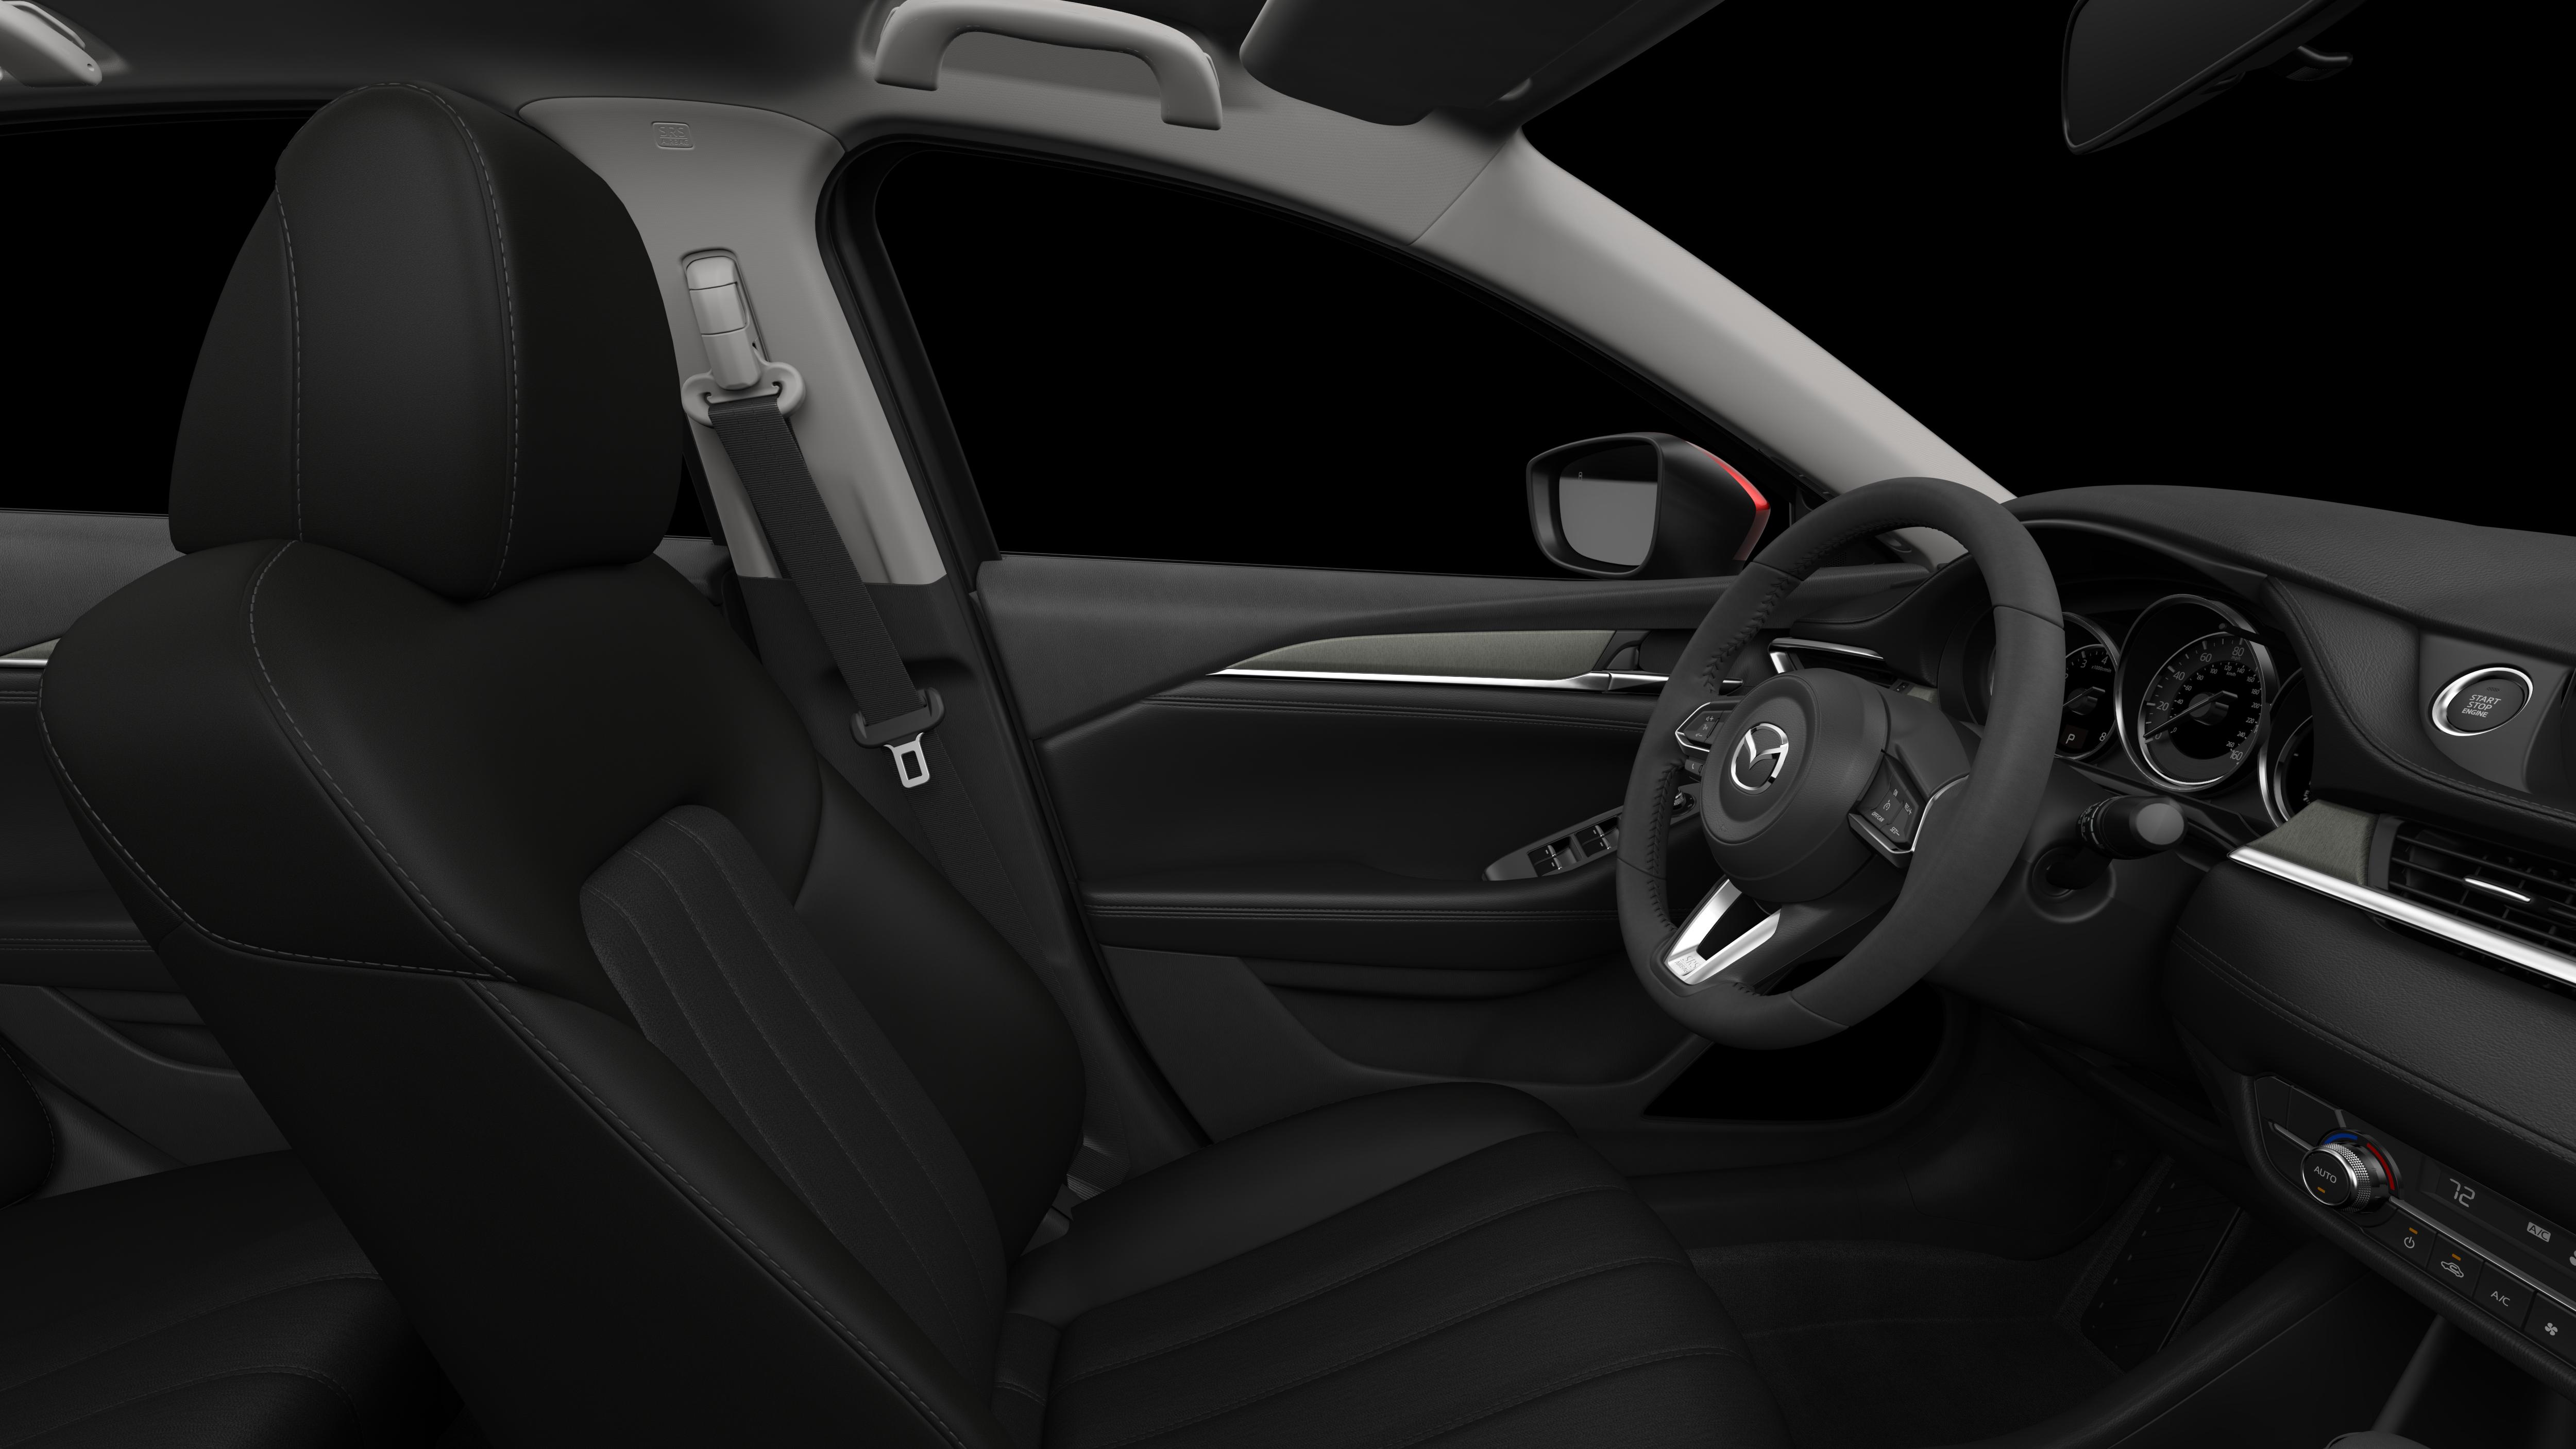 2018 Mazda 6 Turbocharged Sports Sedan Mid Size Cars Mazda Usa